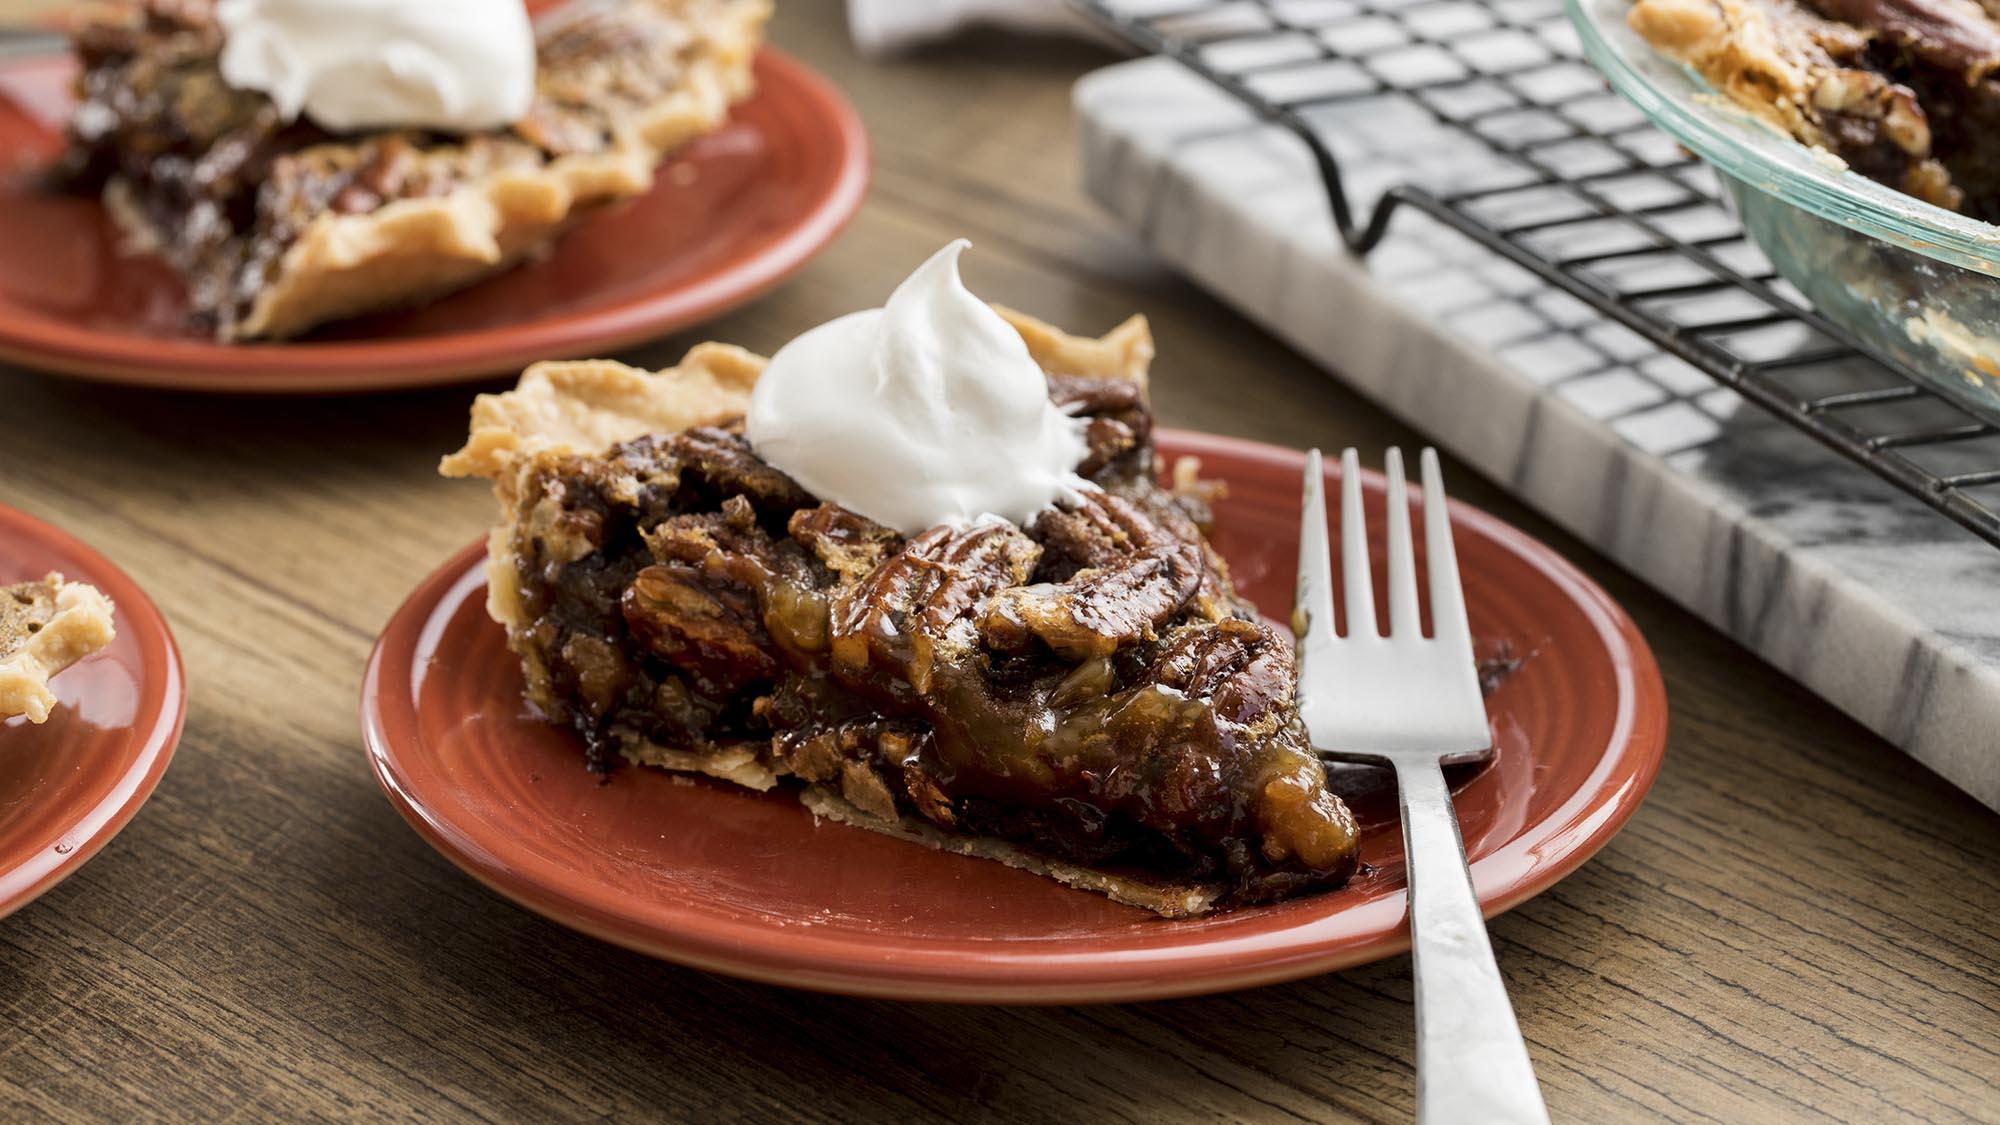 McCormick Chocolate Pecan Pie